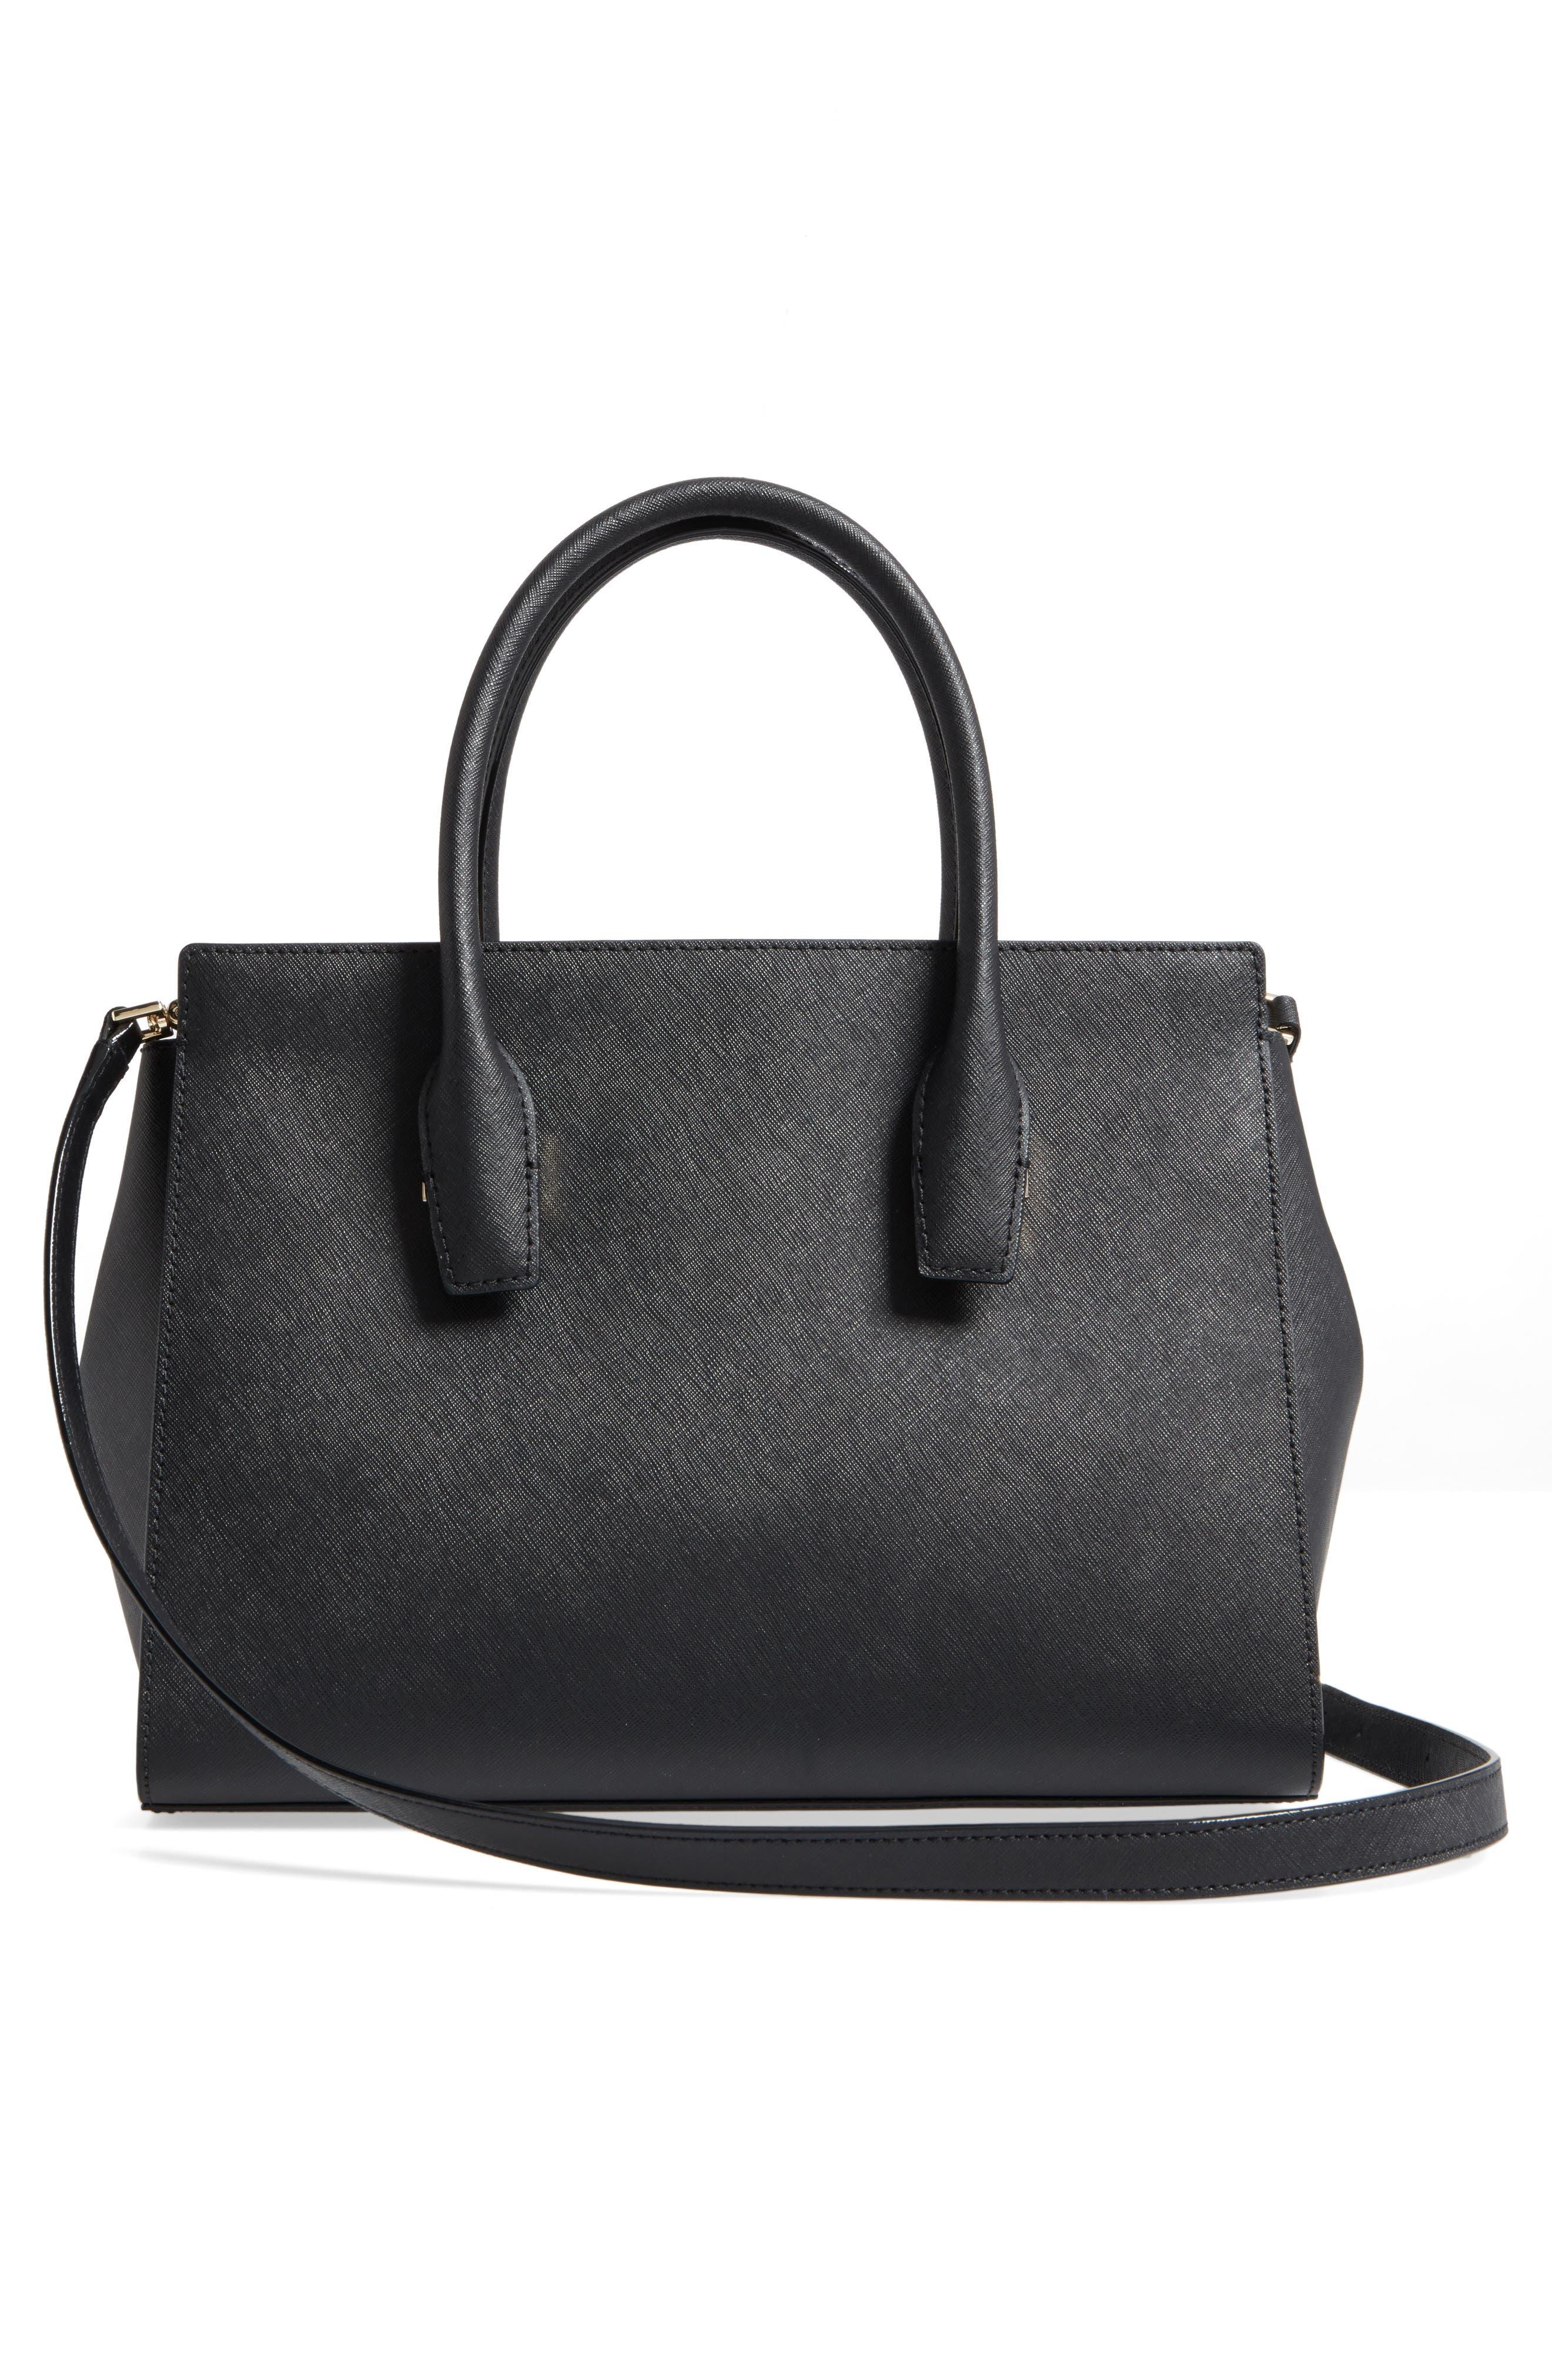 make it mine - candace leather satchel,                             Alternate thumbnail 3, color,                             001